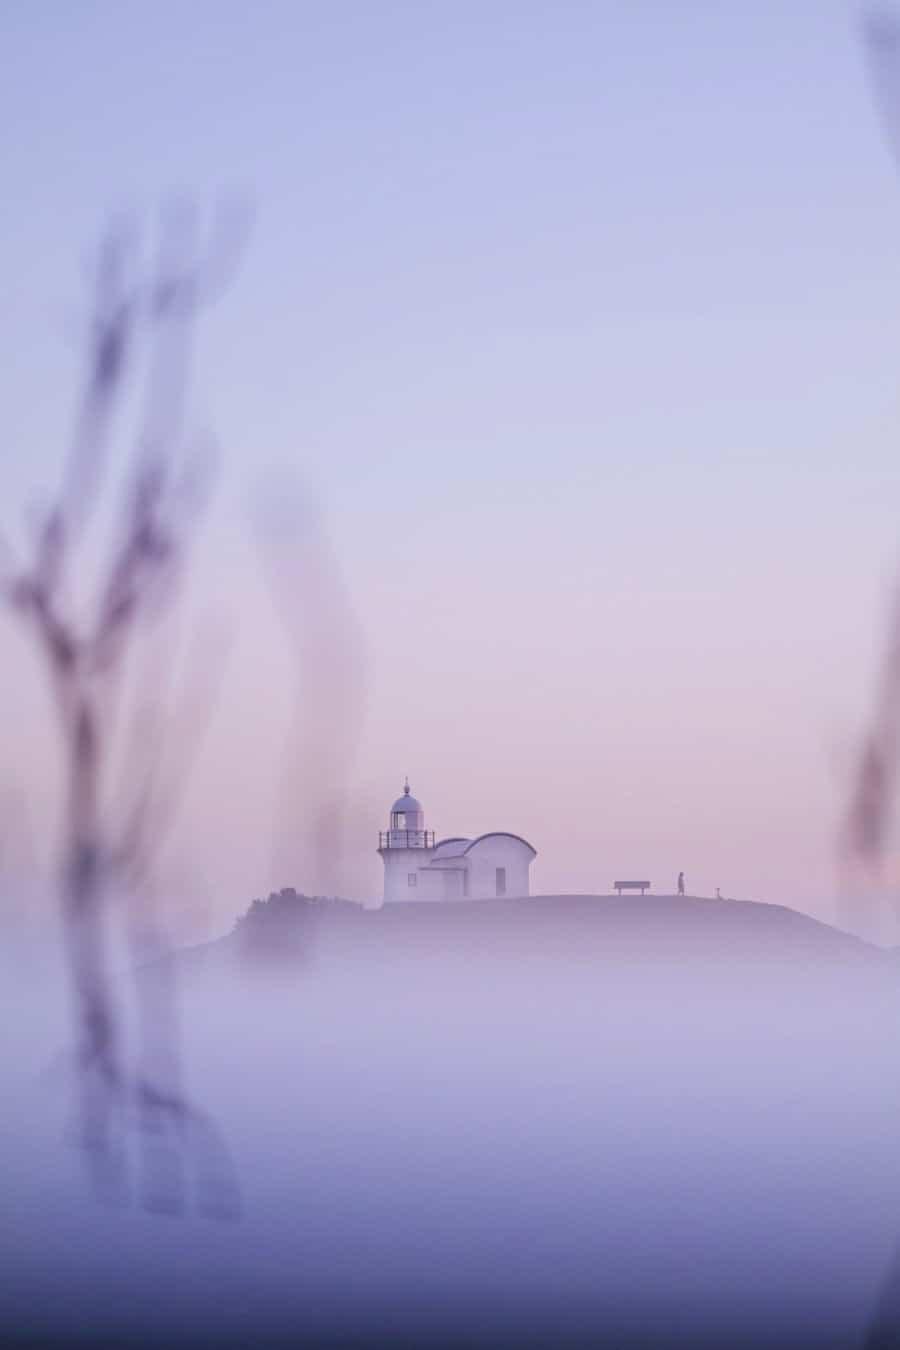 Creating Reflections - Port Macquarie Lighthouse, Australia